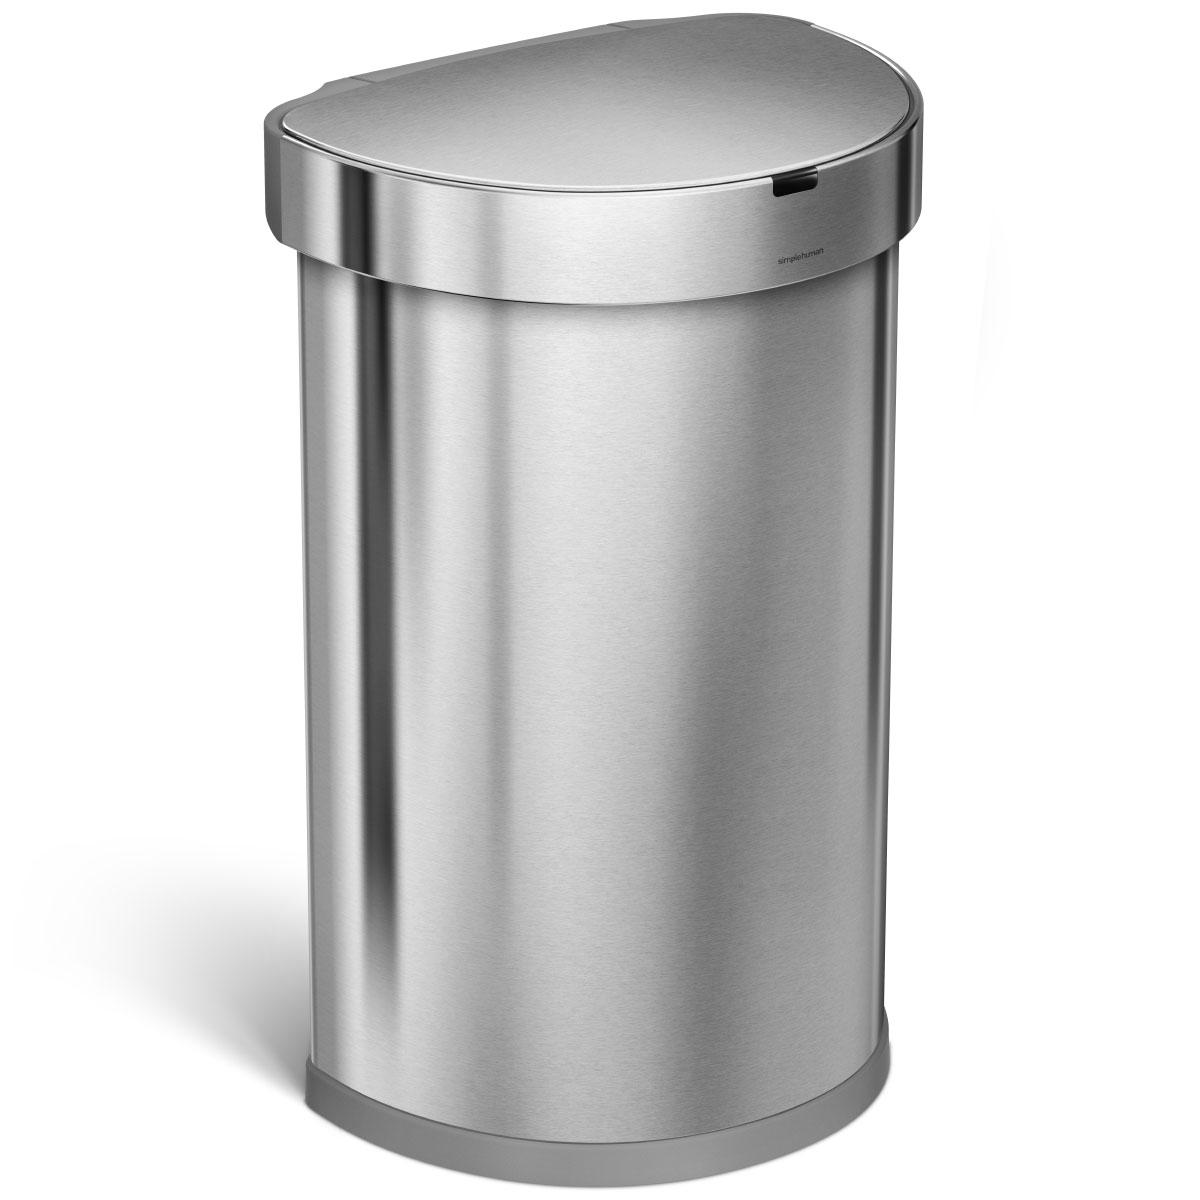 simplehuman ゴミ箱 センサーカン セミラウンド 45L ふた付き センサー式 フタ自動オープン ダストボックス ごみ箱 上質で上品でオシャレなゴミ箱です! シンプルヒューマン 正規品 メーカー保証付き ゴミ箱 45リットル ST2009 シルバー